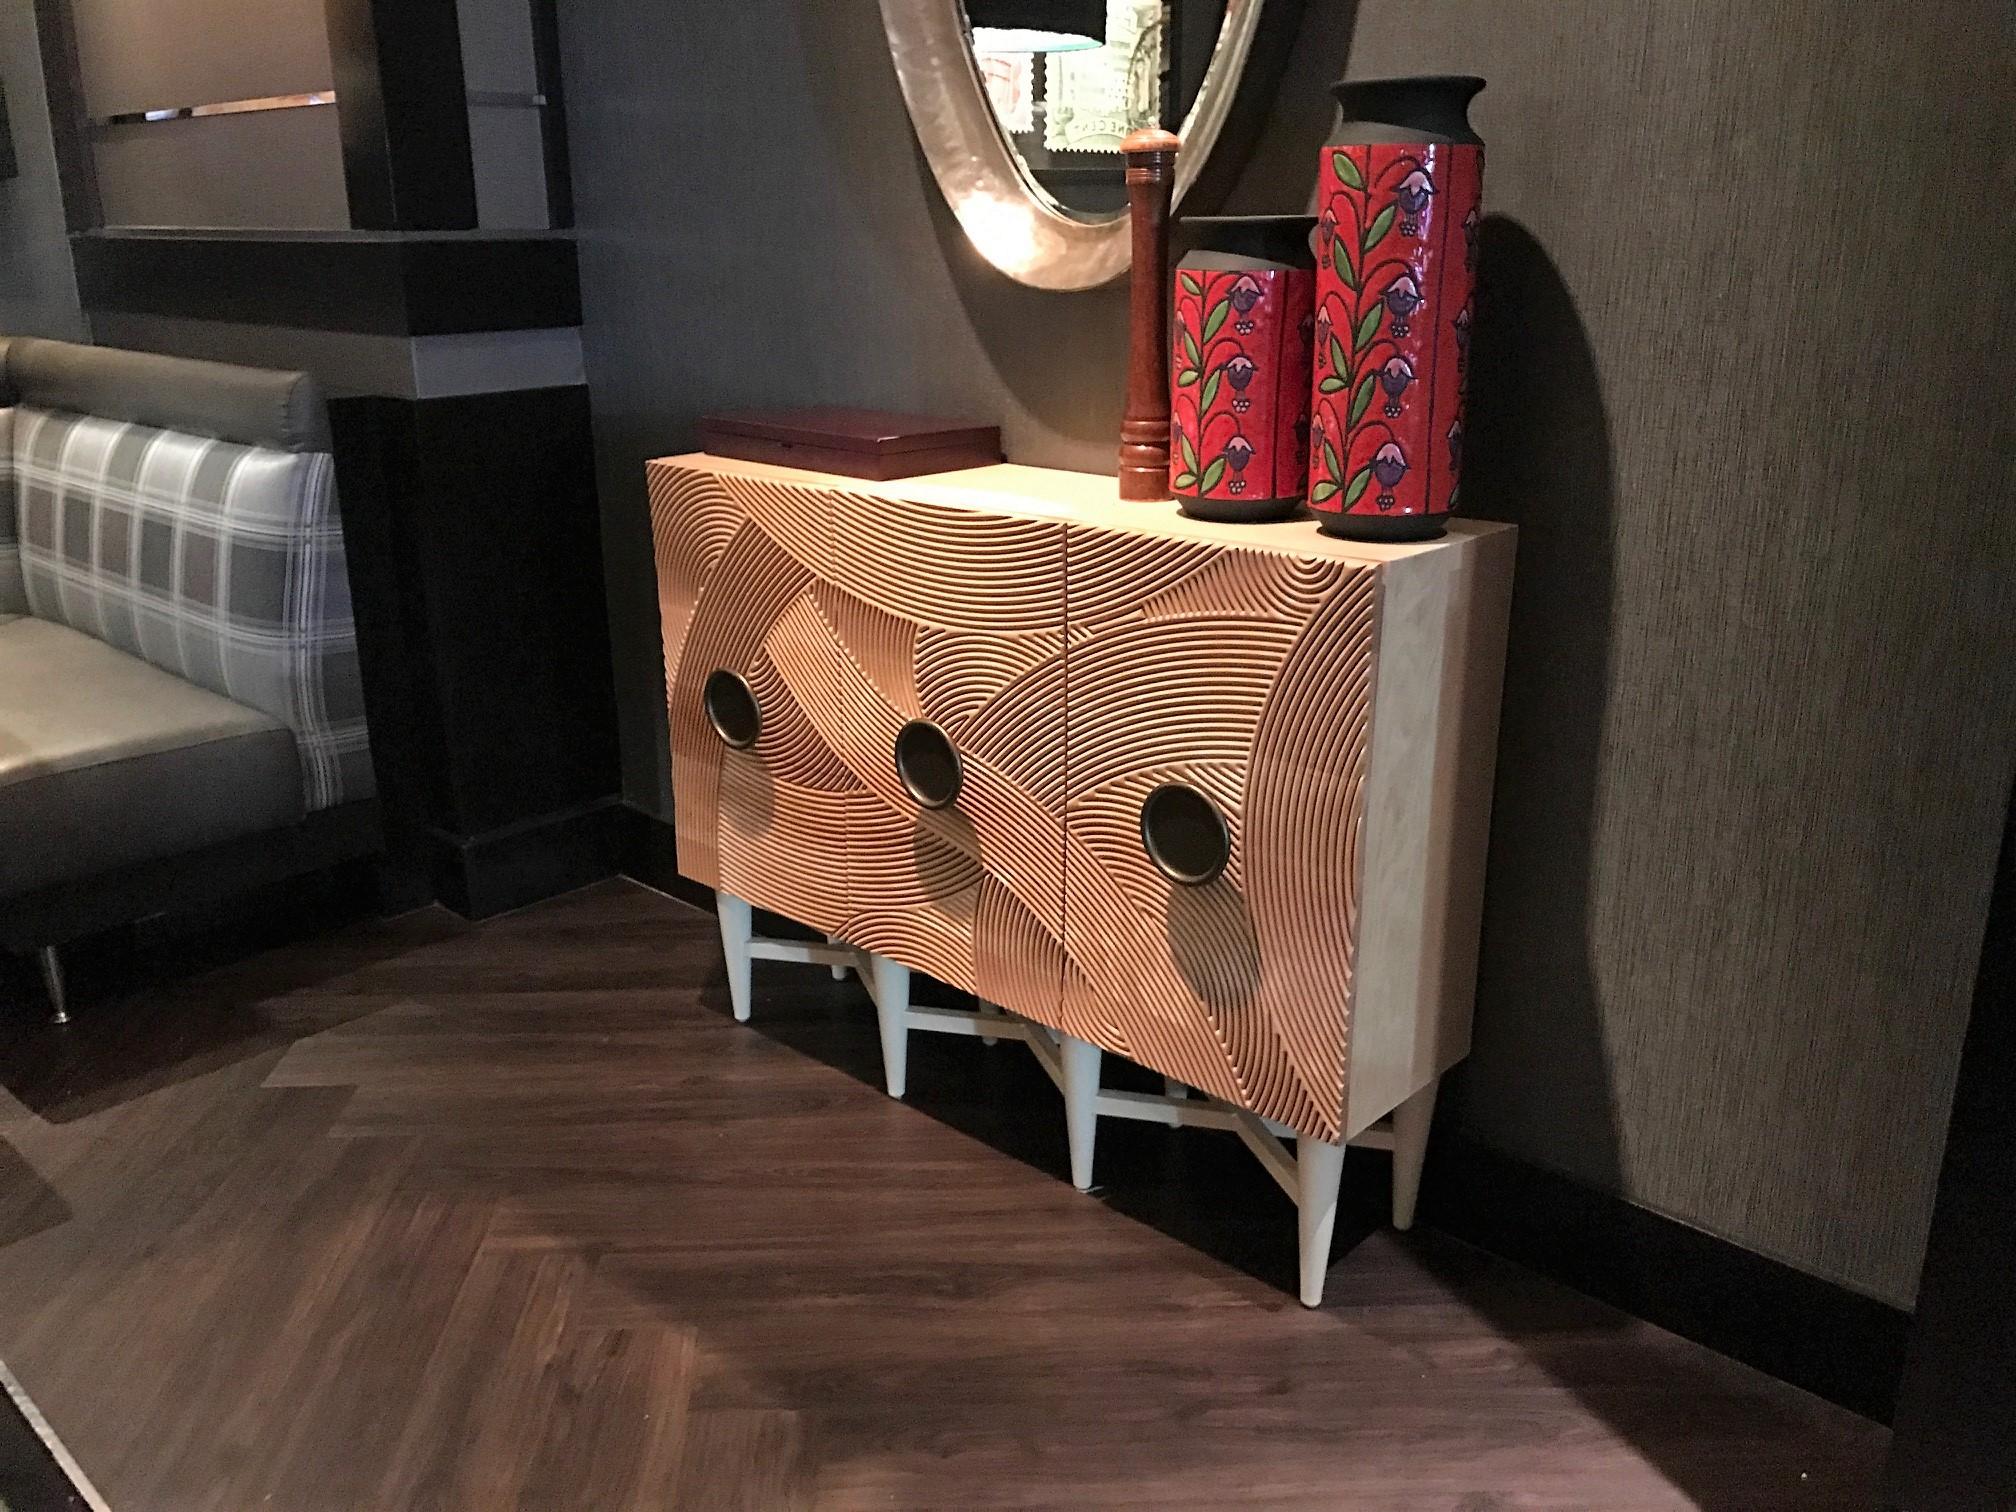 Redwood Steakhouse @ The California Hotel, Las Vegas